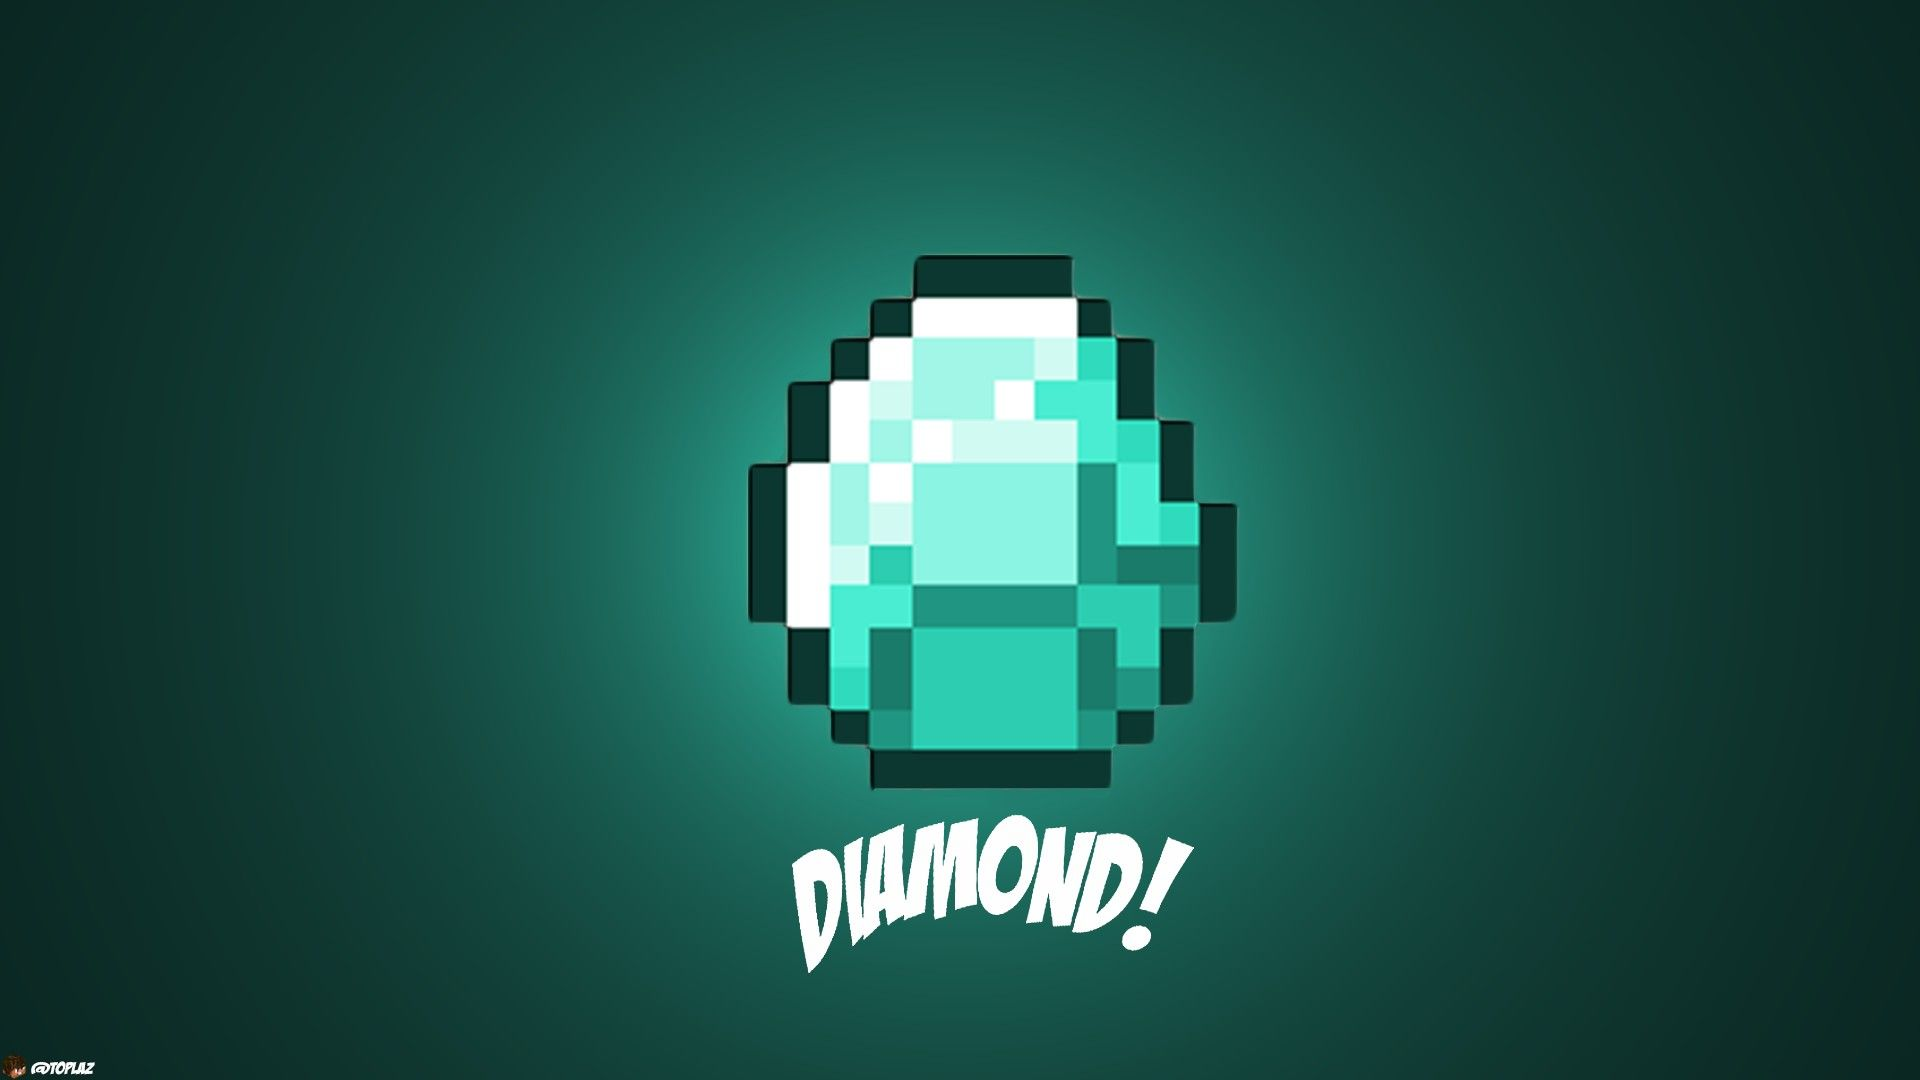 Youtube tech365. Minecraft diamond images hd